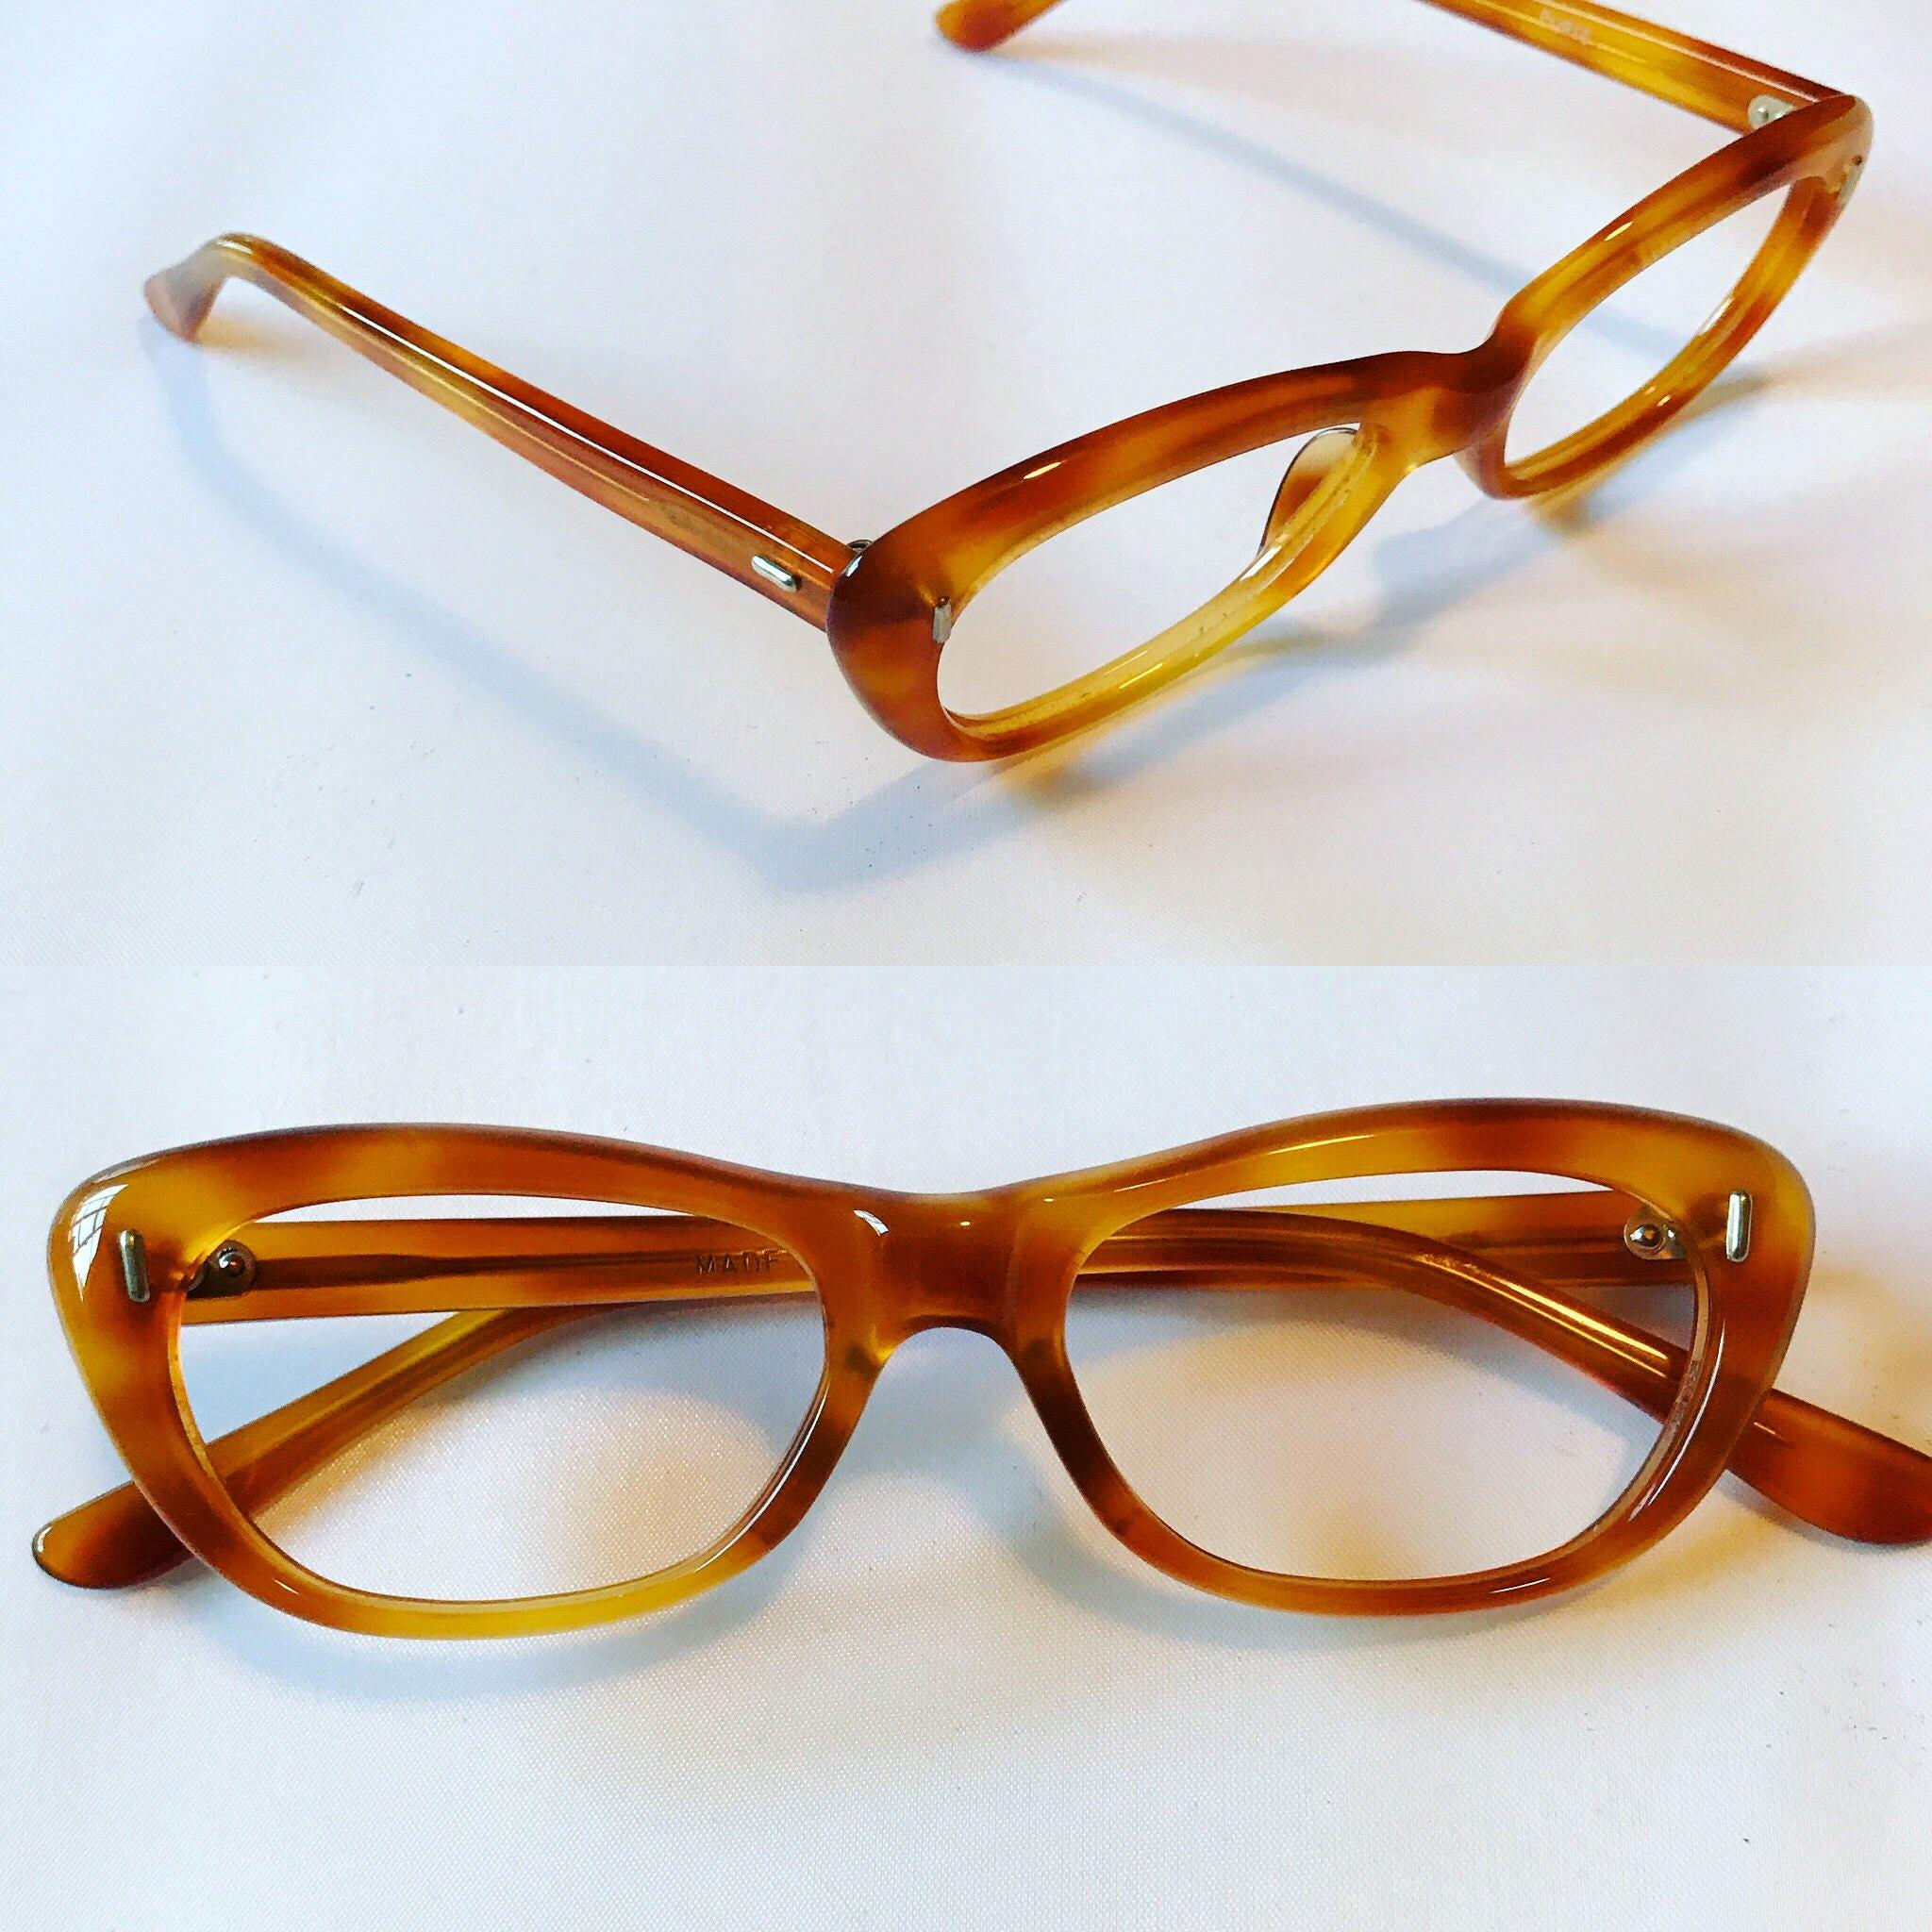 e4c647fb4dd Amber Colored Tortoise Cateye Glasses